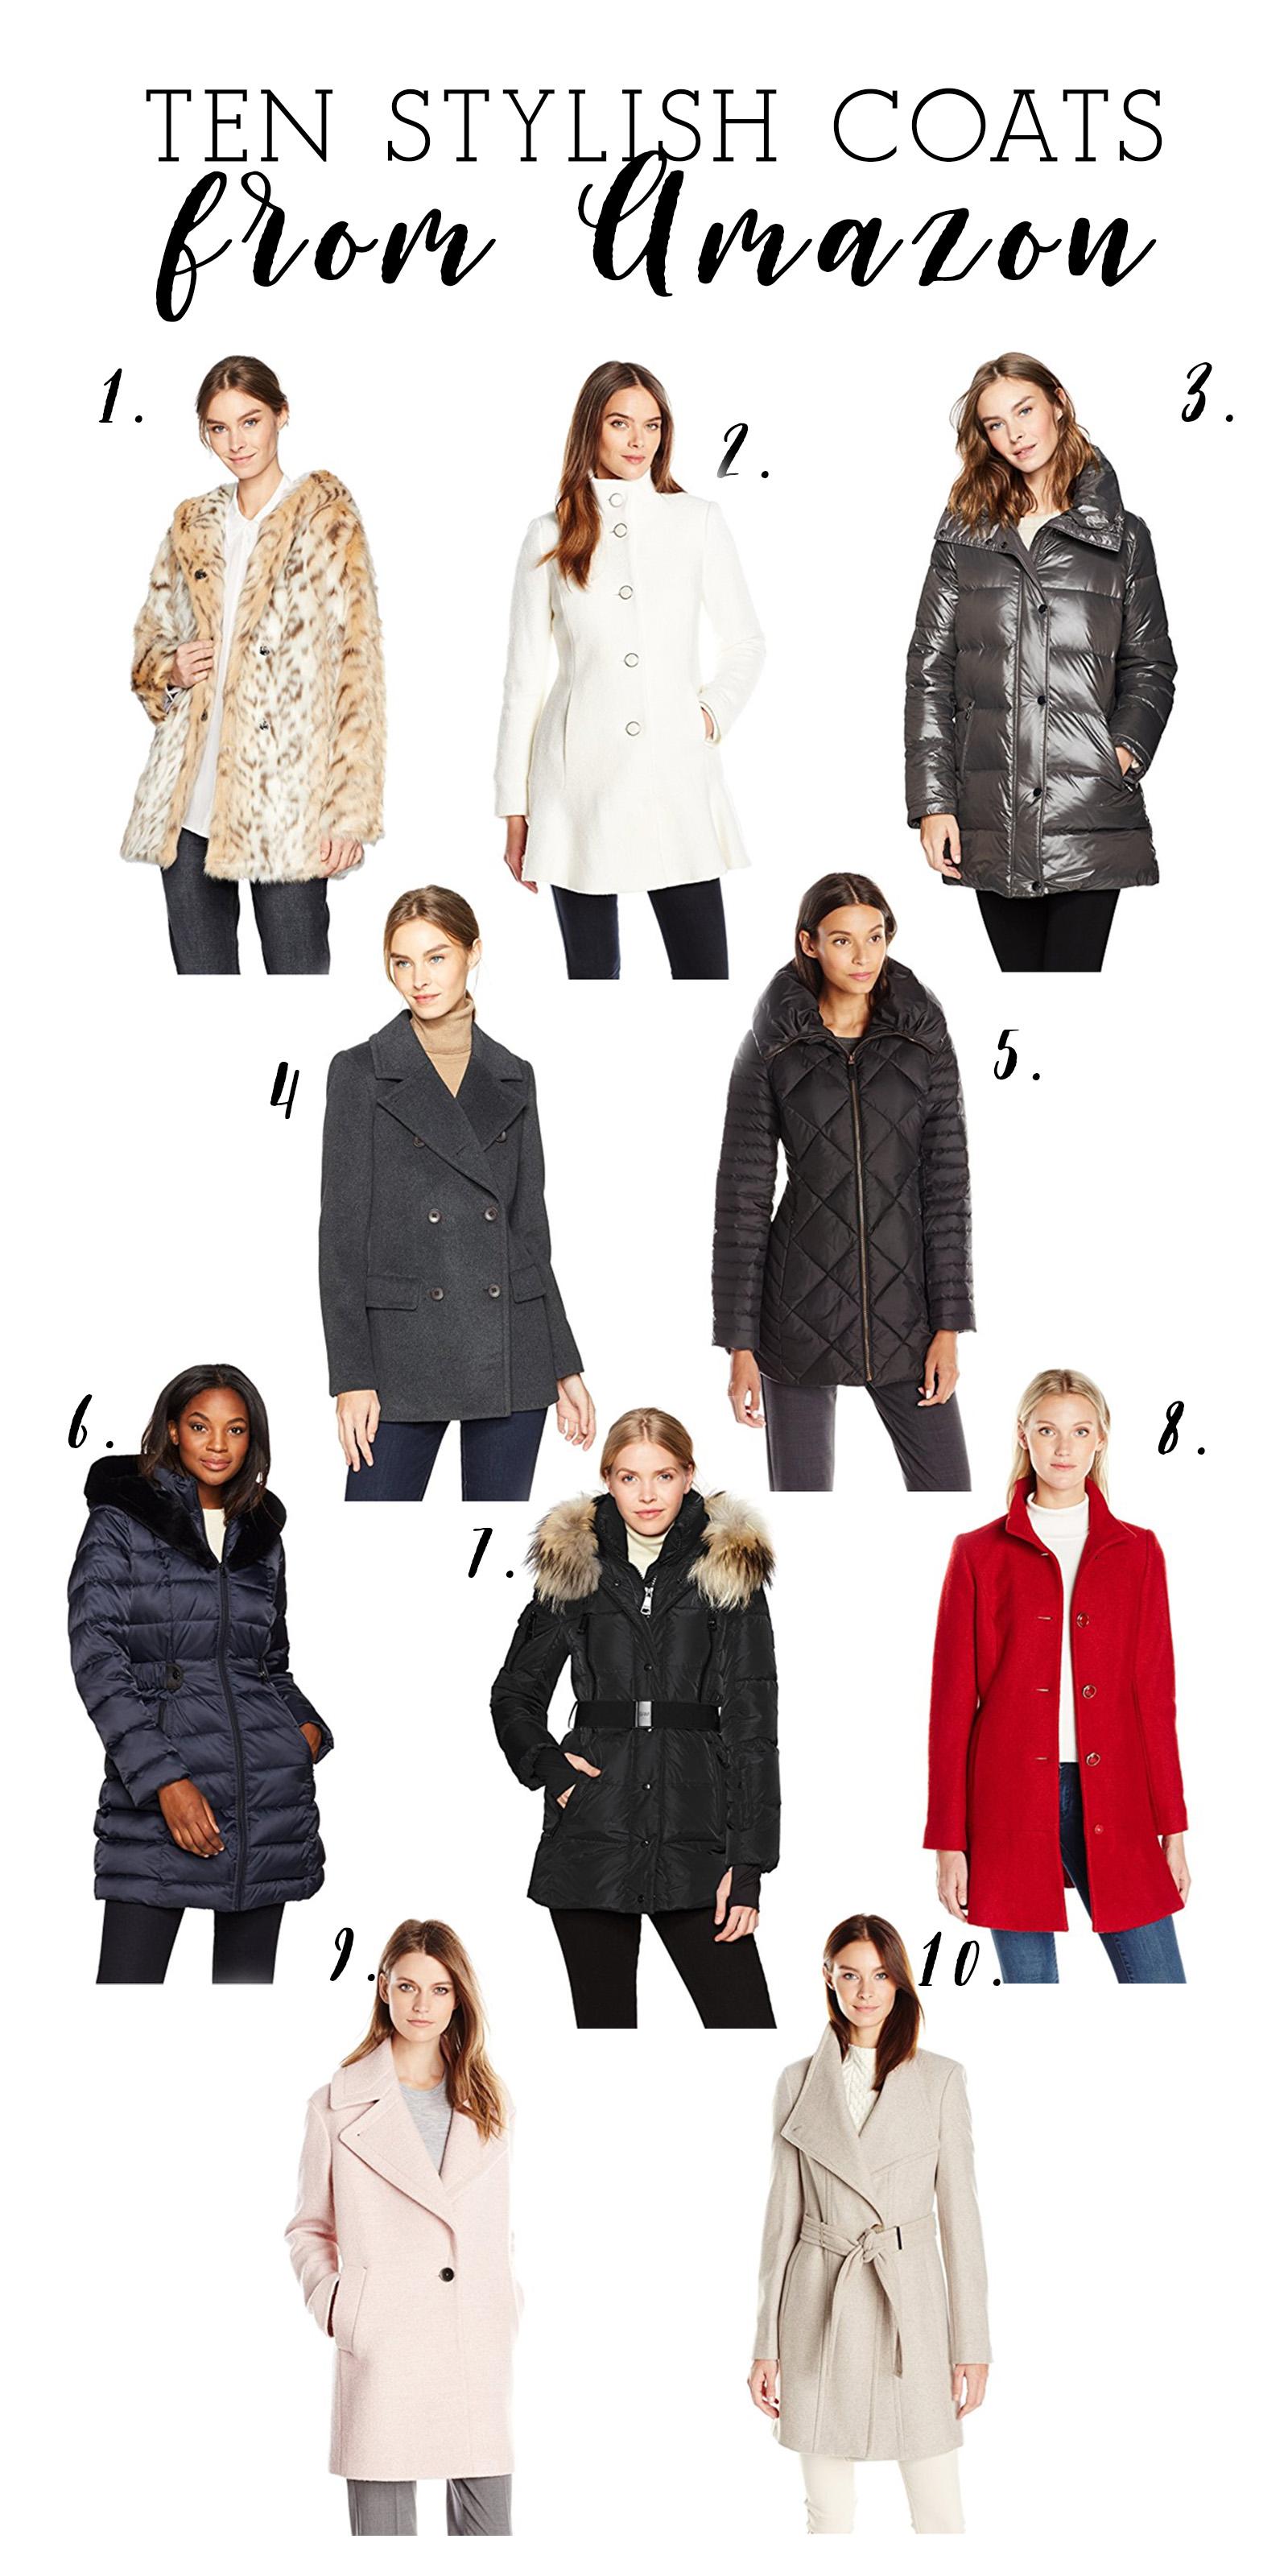 0f4d5b236b1 11 Warm and Stylish Coats from Amazon...